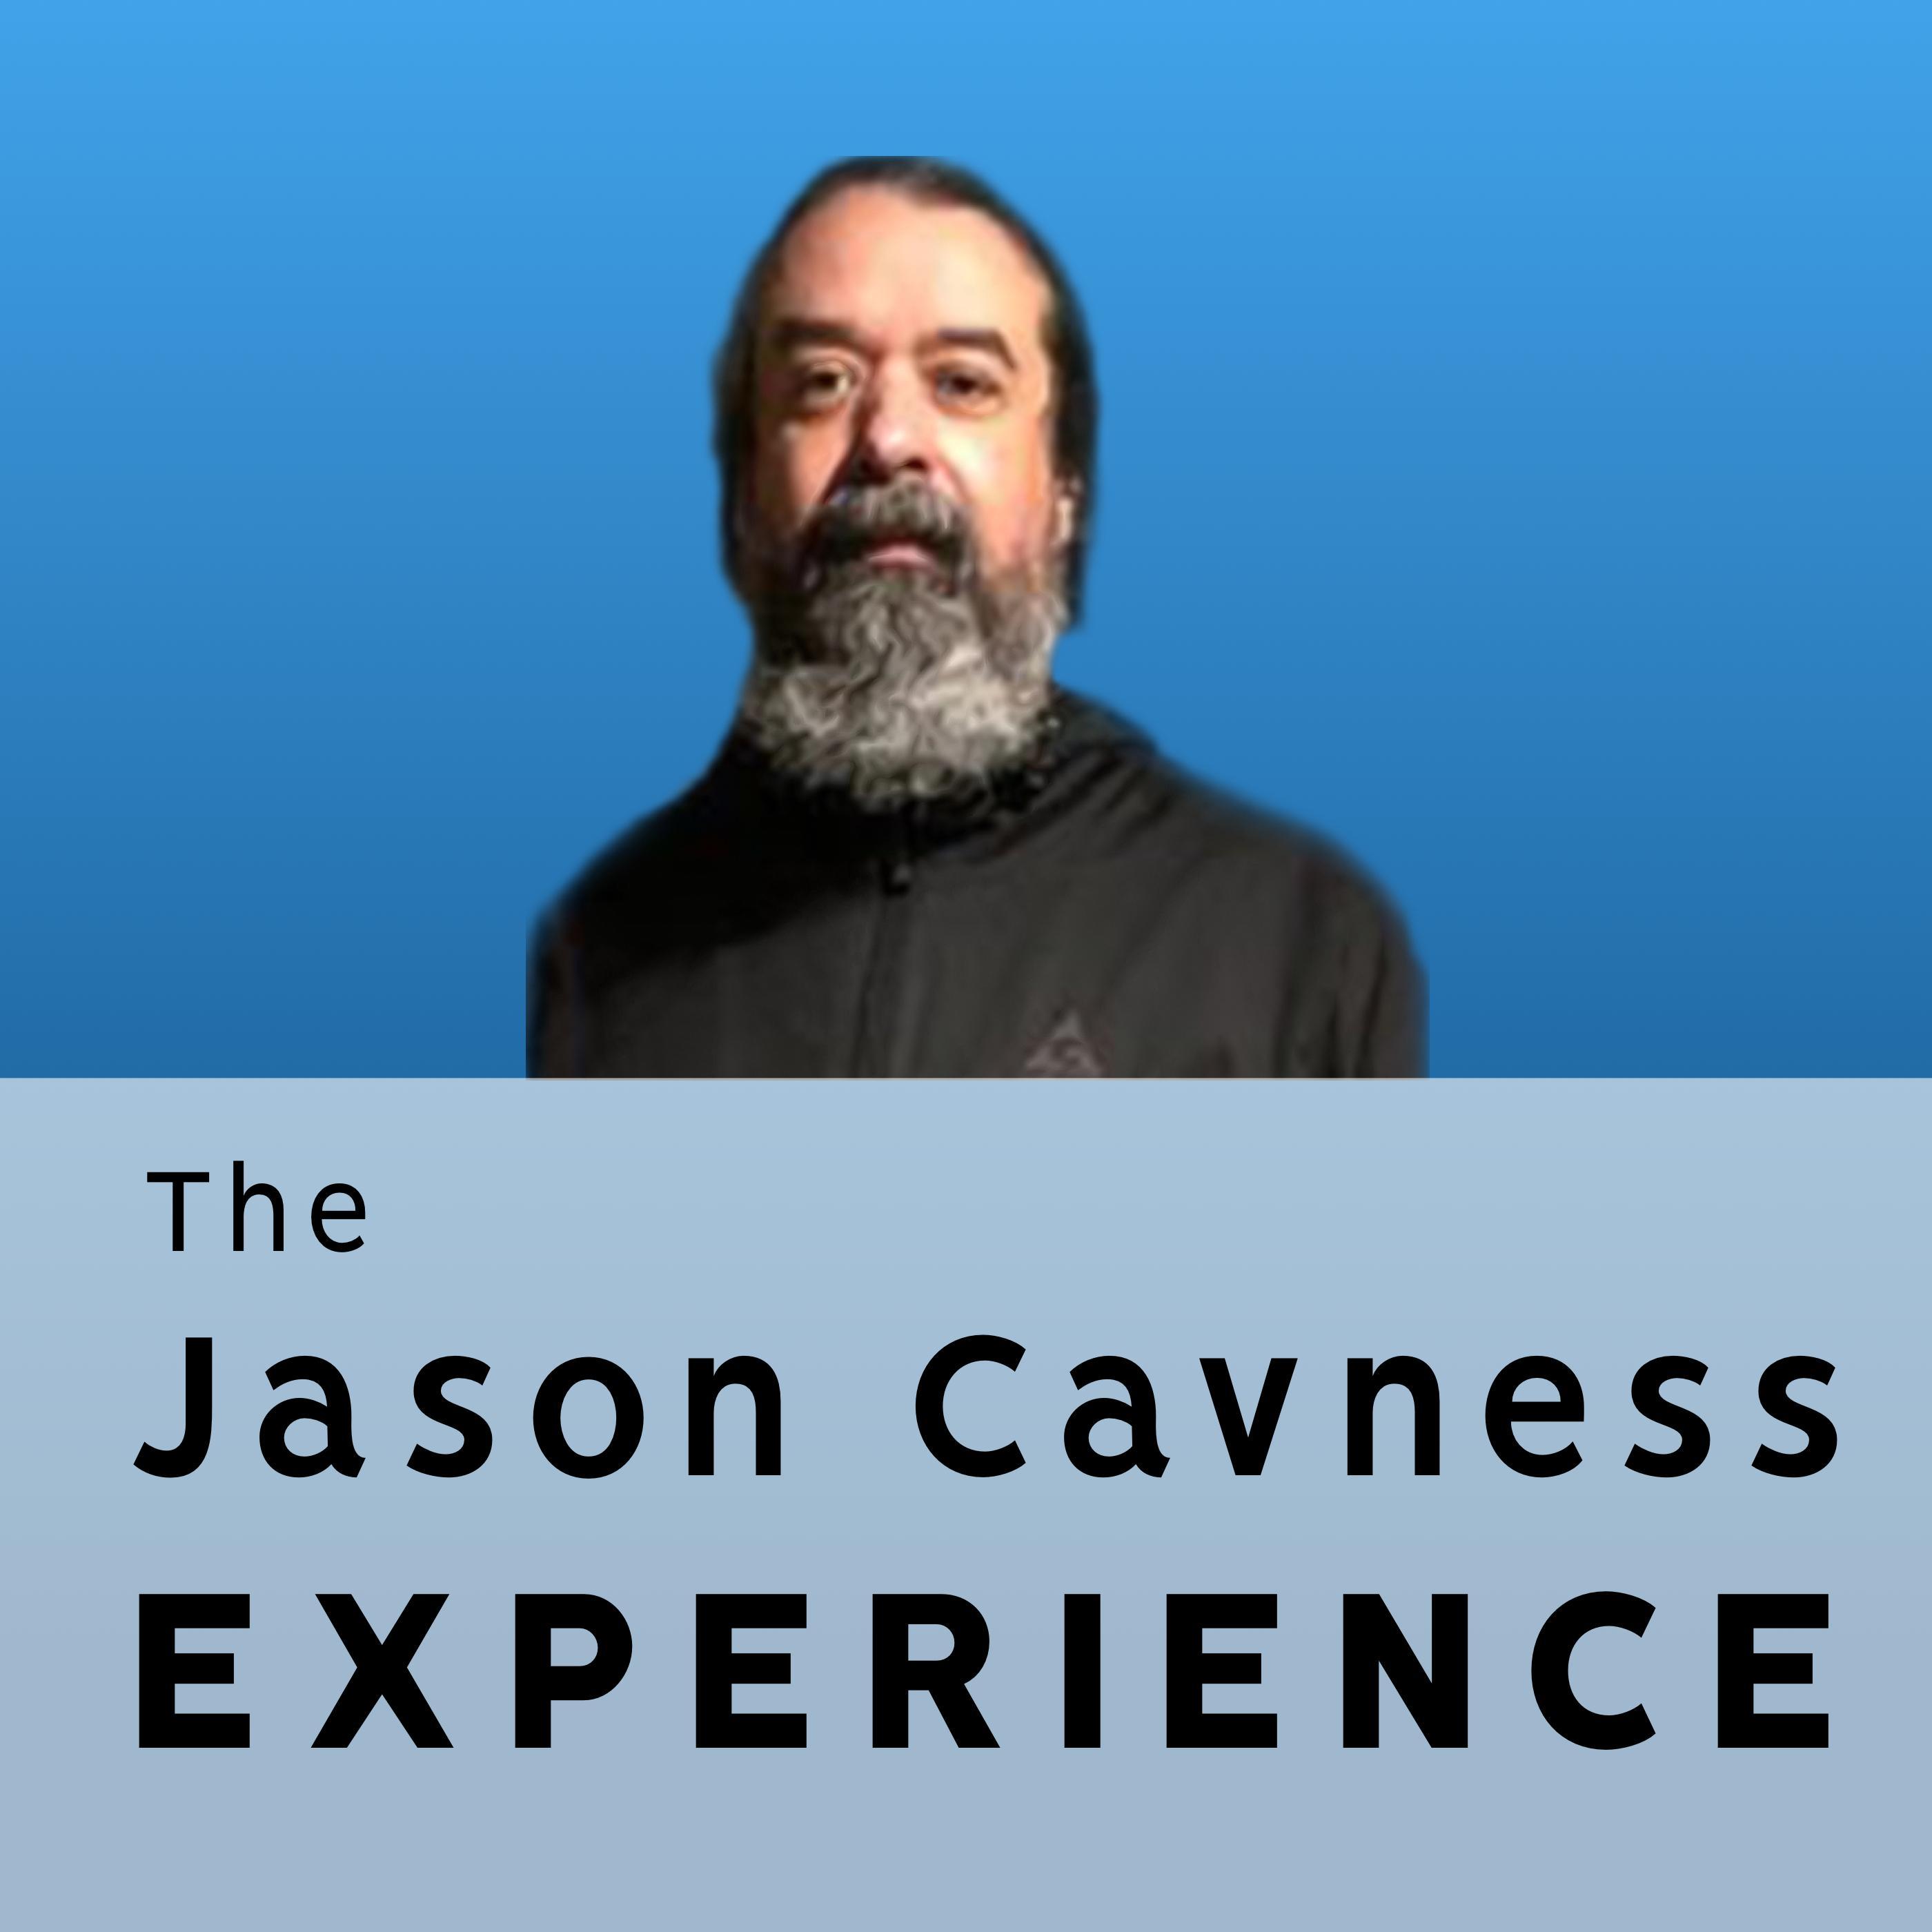 CavnessHR Crowdfunding Campaign Update